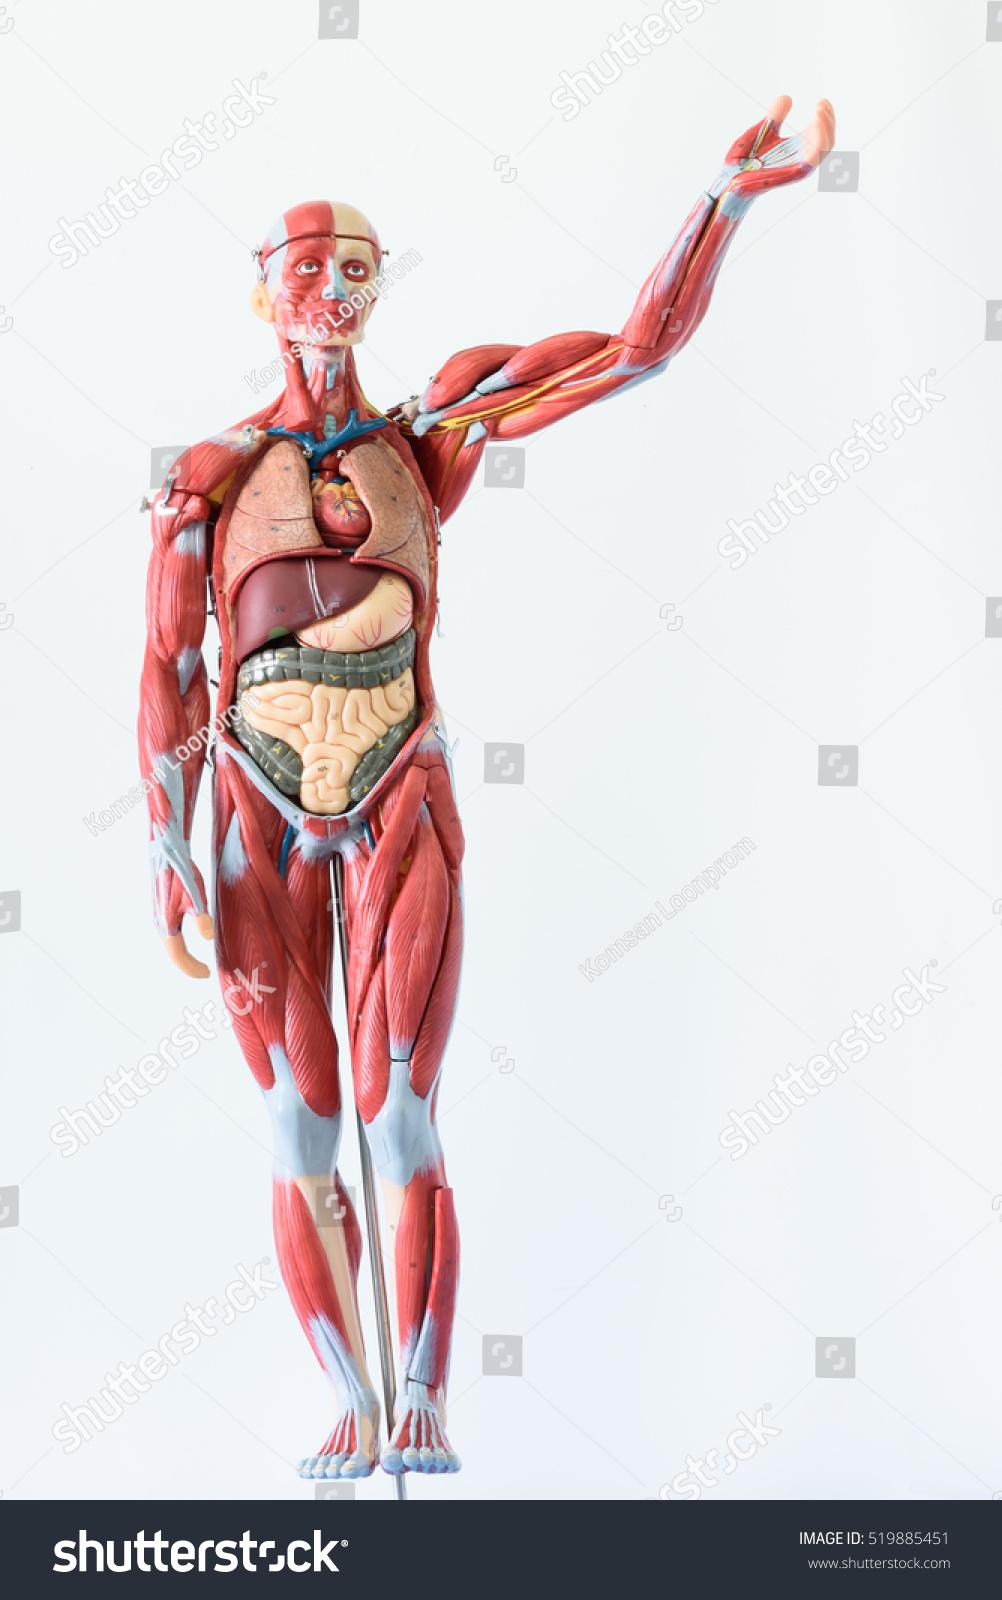 Anatomy Human Body Model On White Stock Photo 519885451 - Shutterstock